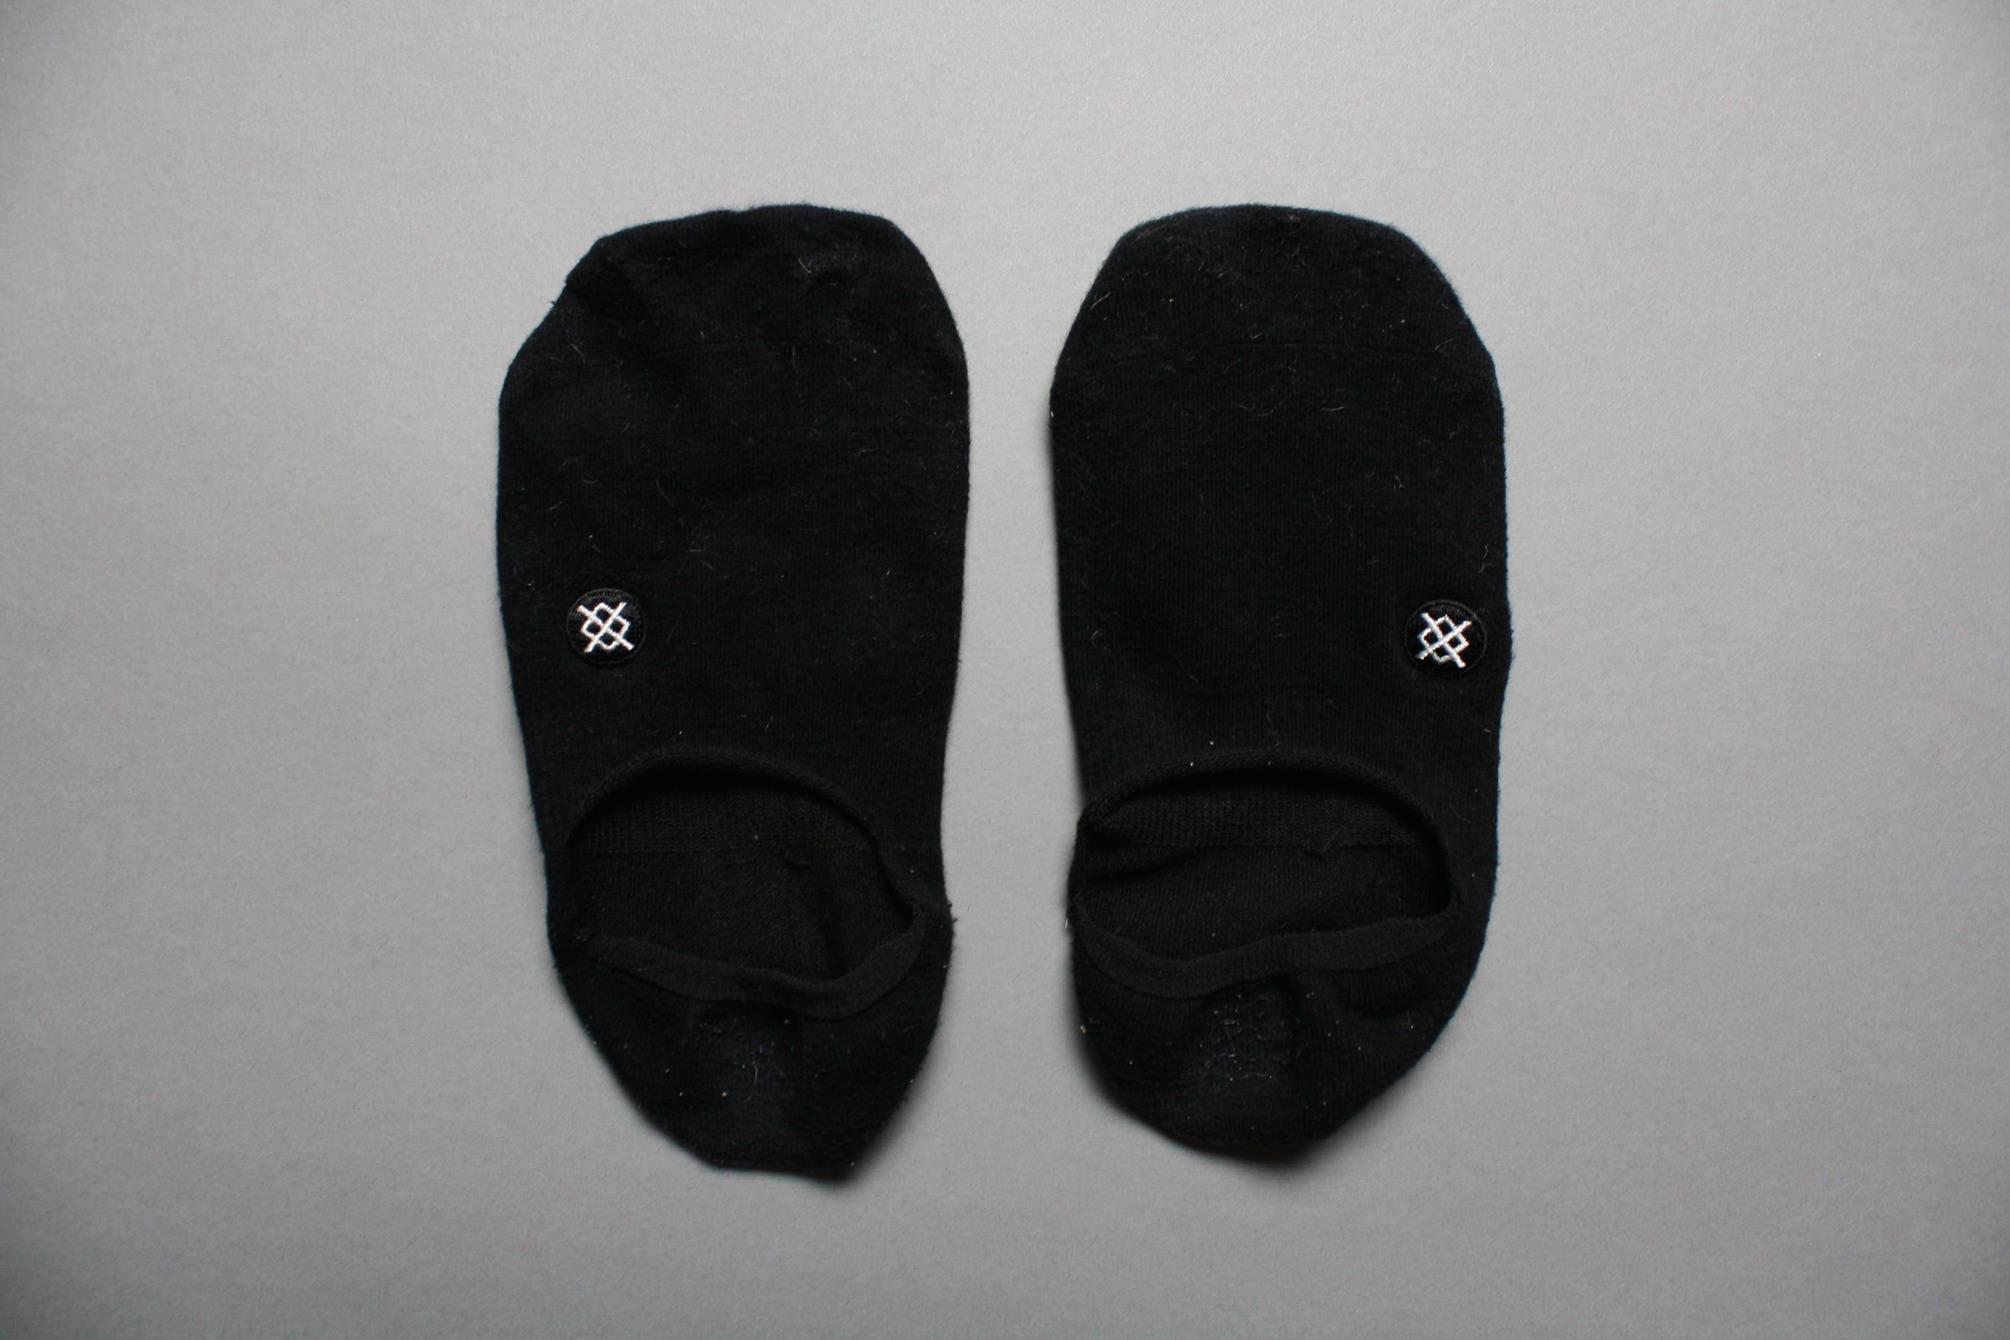 Stance no show socks